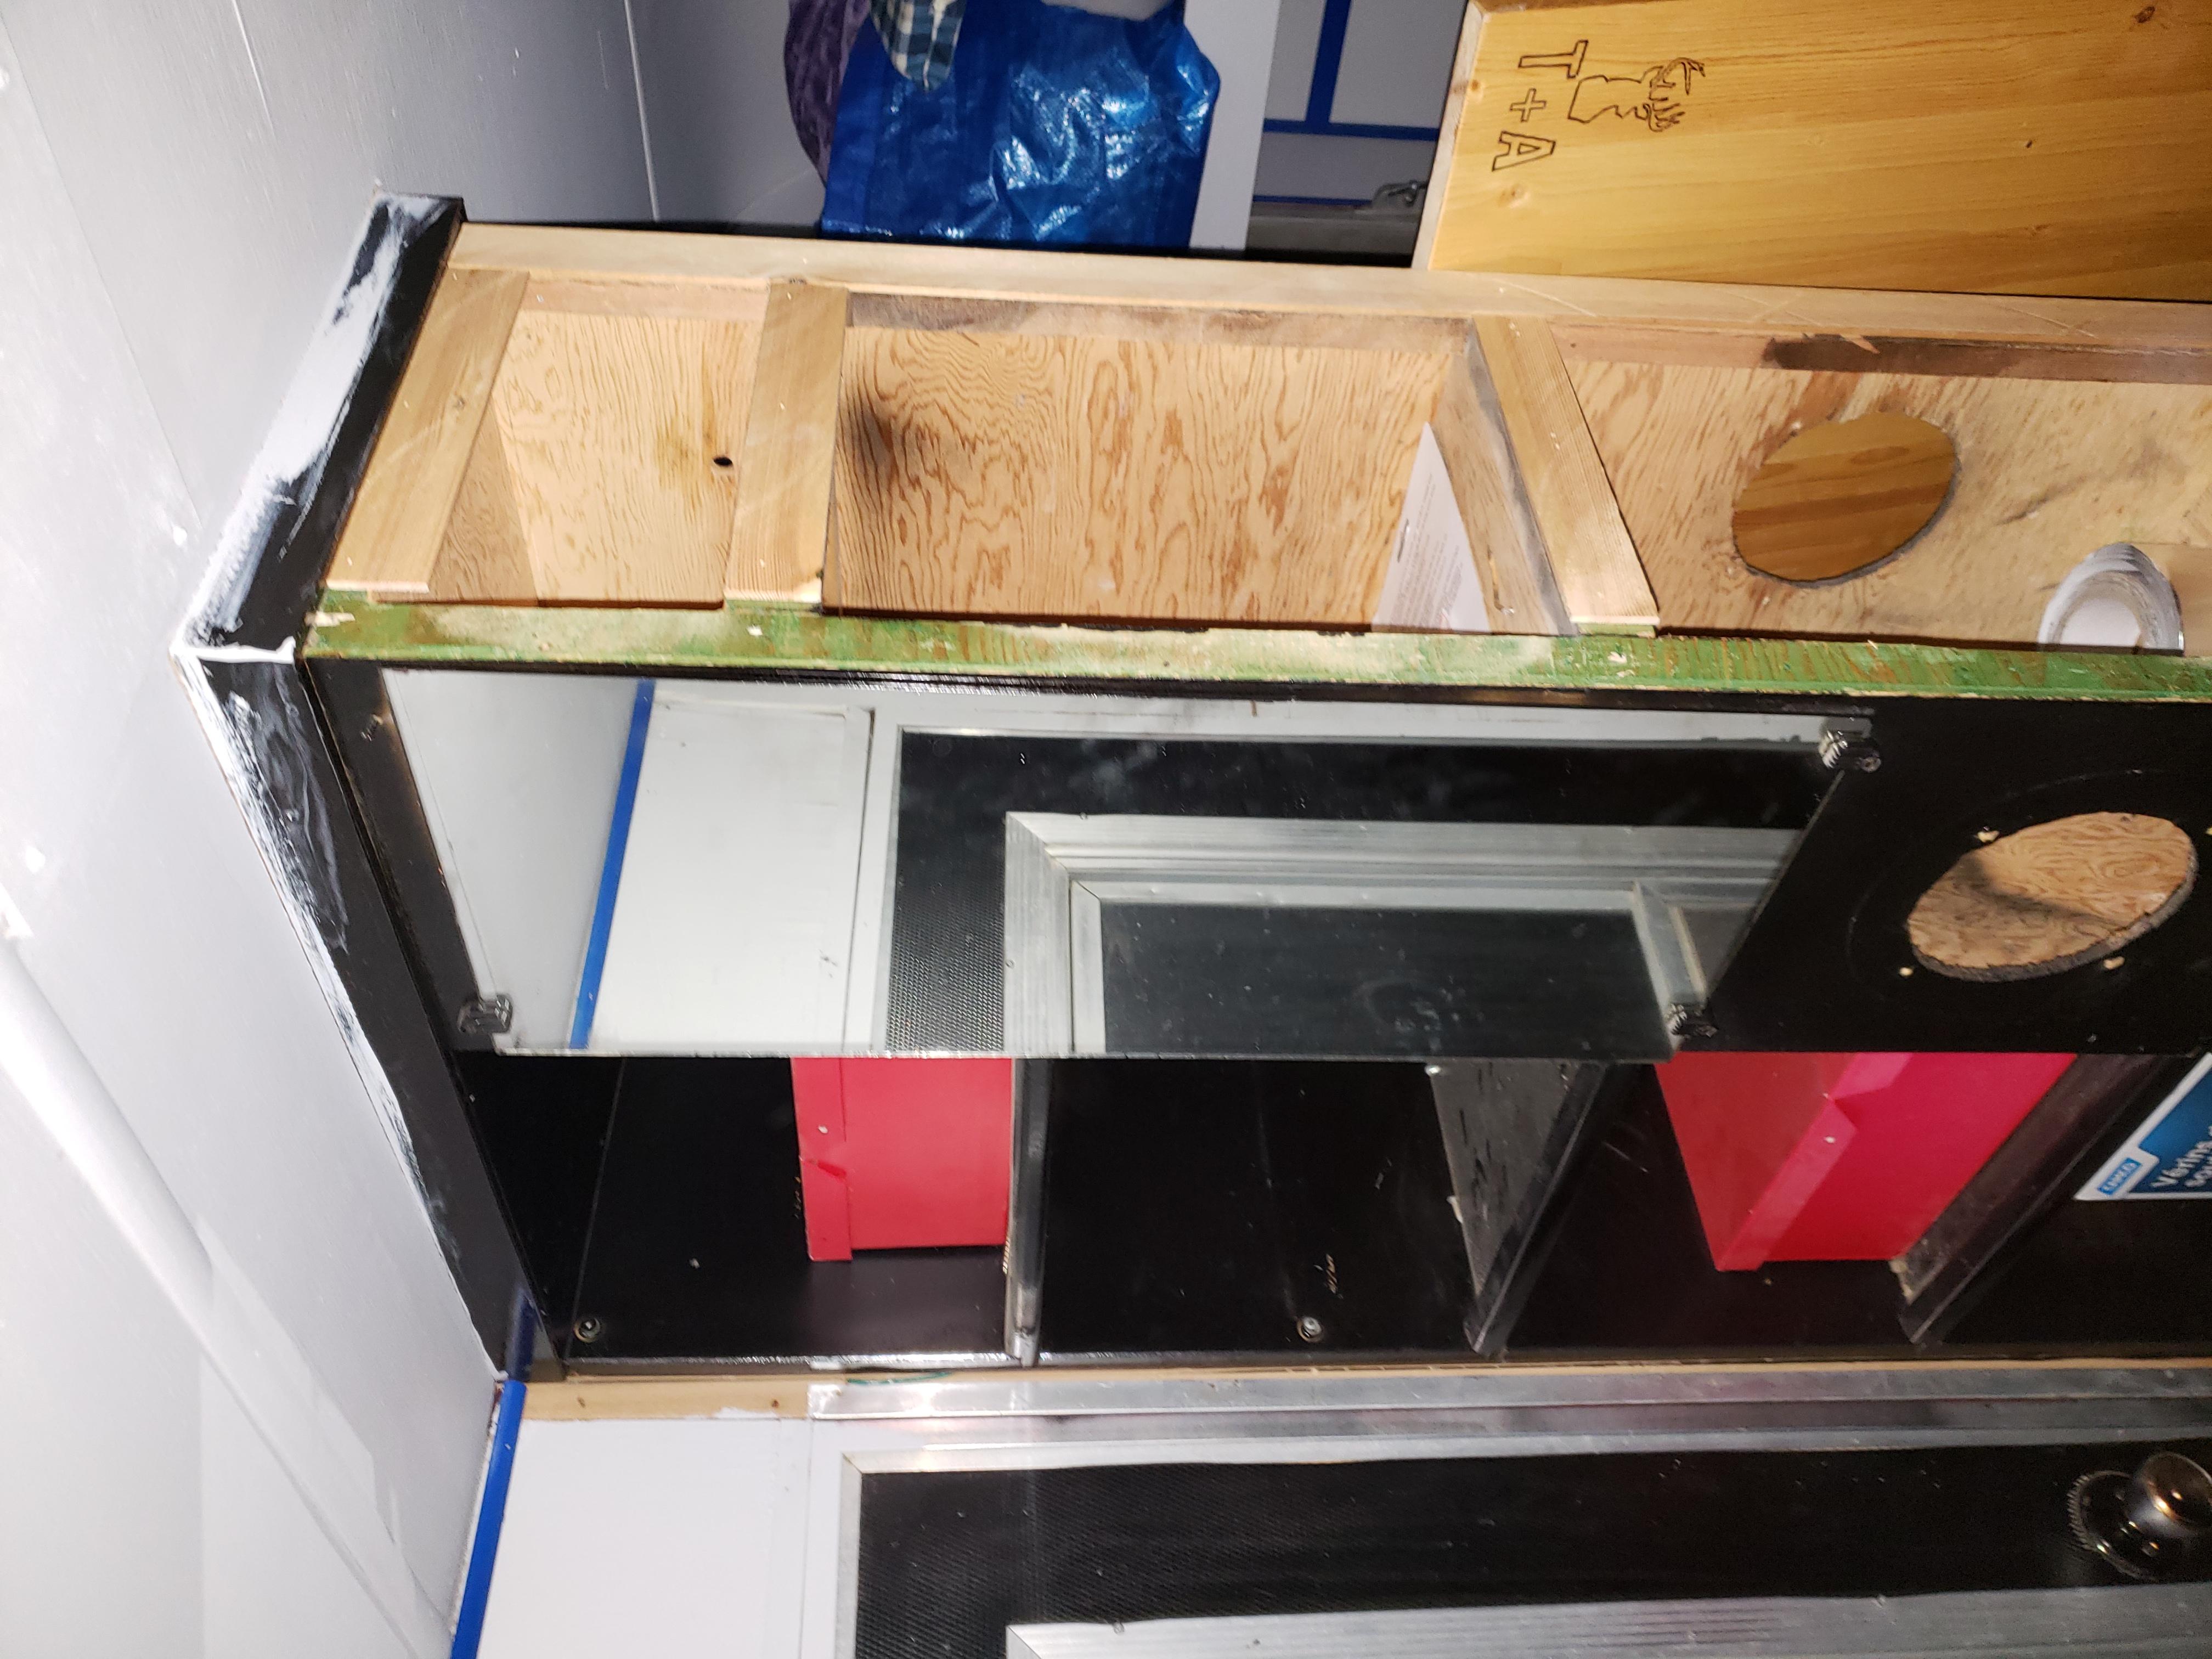 Shelf removal.-20180715_235906_1532390825174.jpg